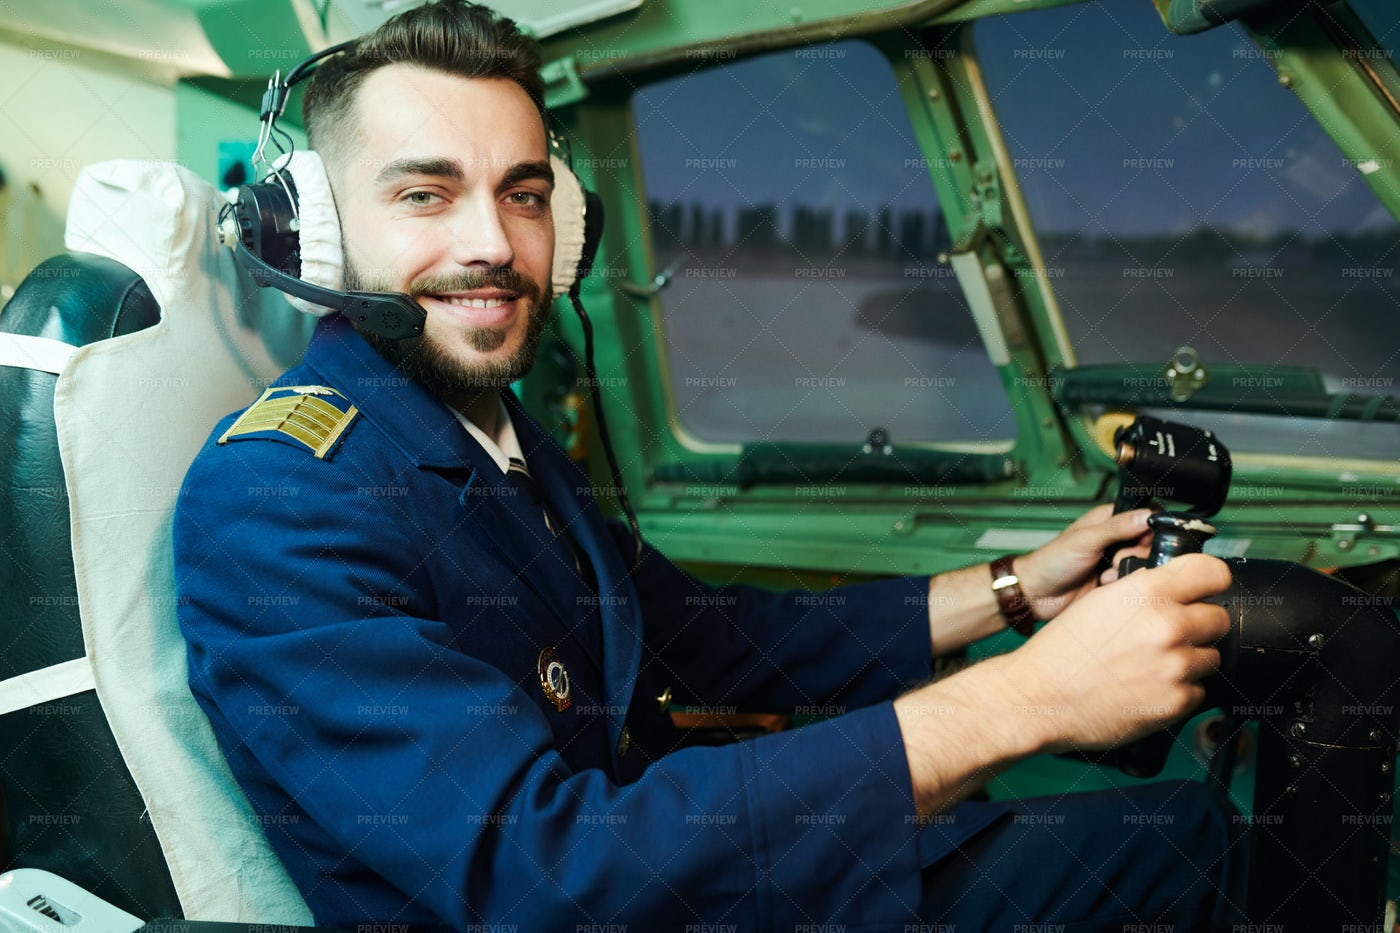 Smiling Pilot In Airplane: Stock Photos